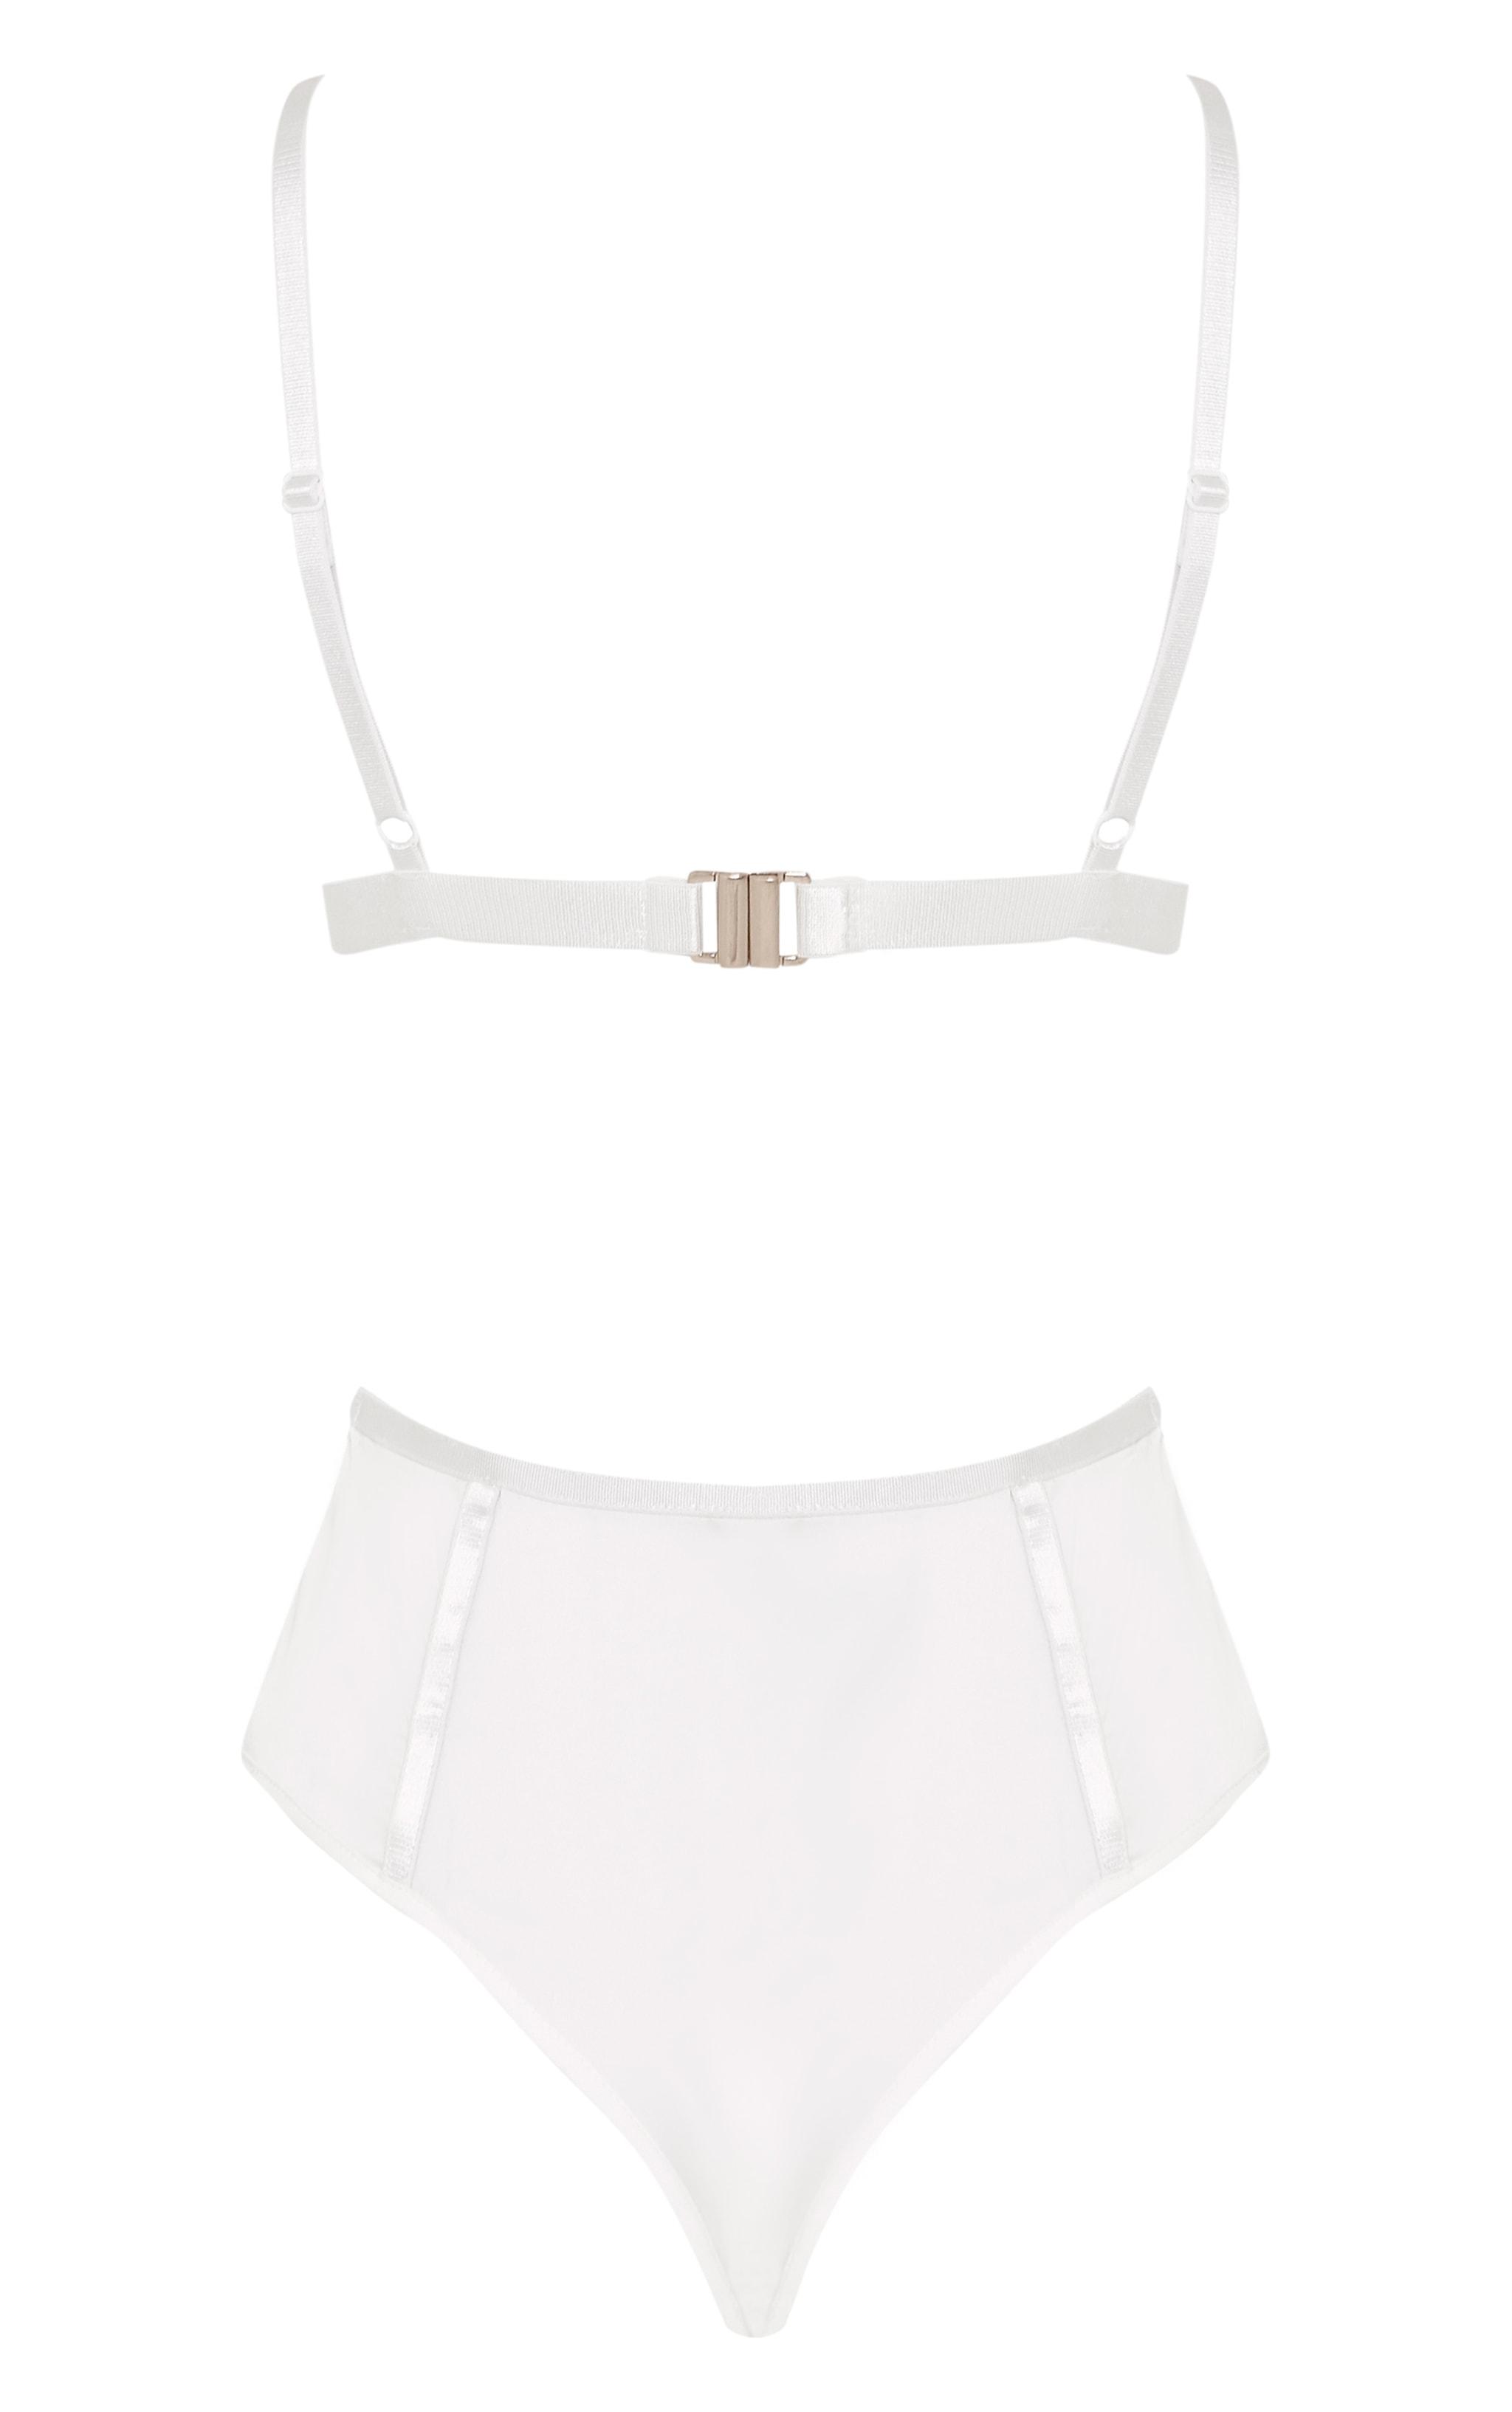 Analia White Lace Backless Thong Bodysuit 3